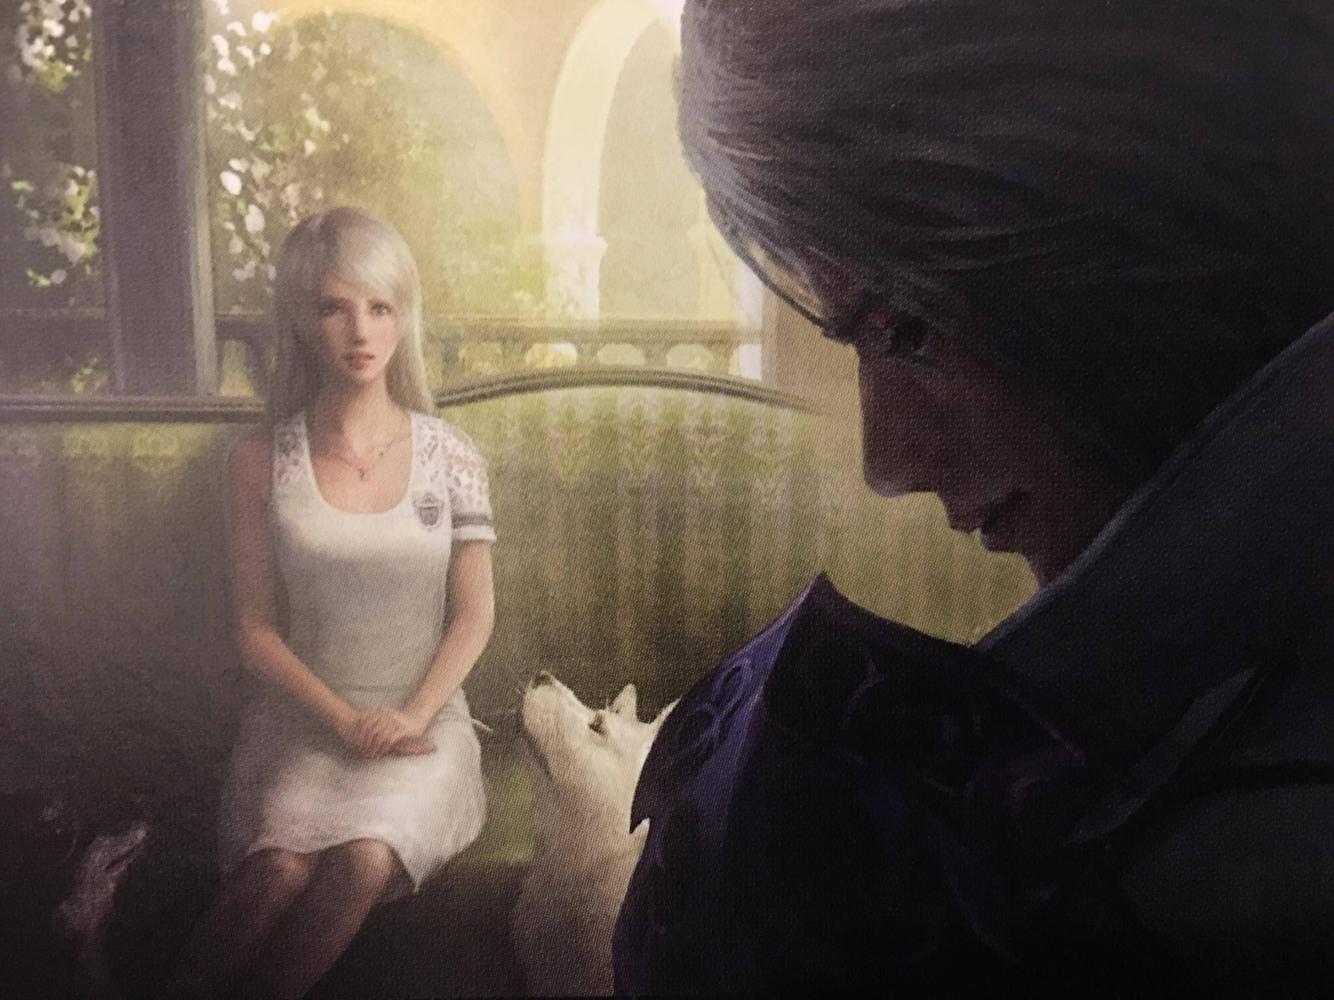 Ravus Nox Fleuret | Final Fantasy Wiki | FANDOM powered by Wikia